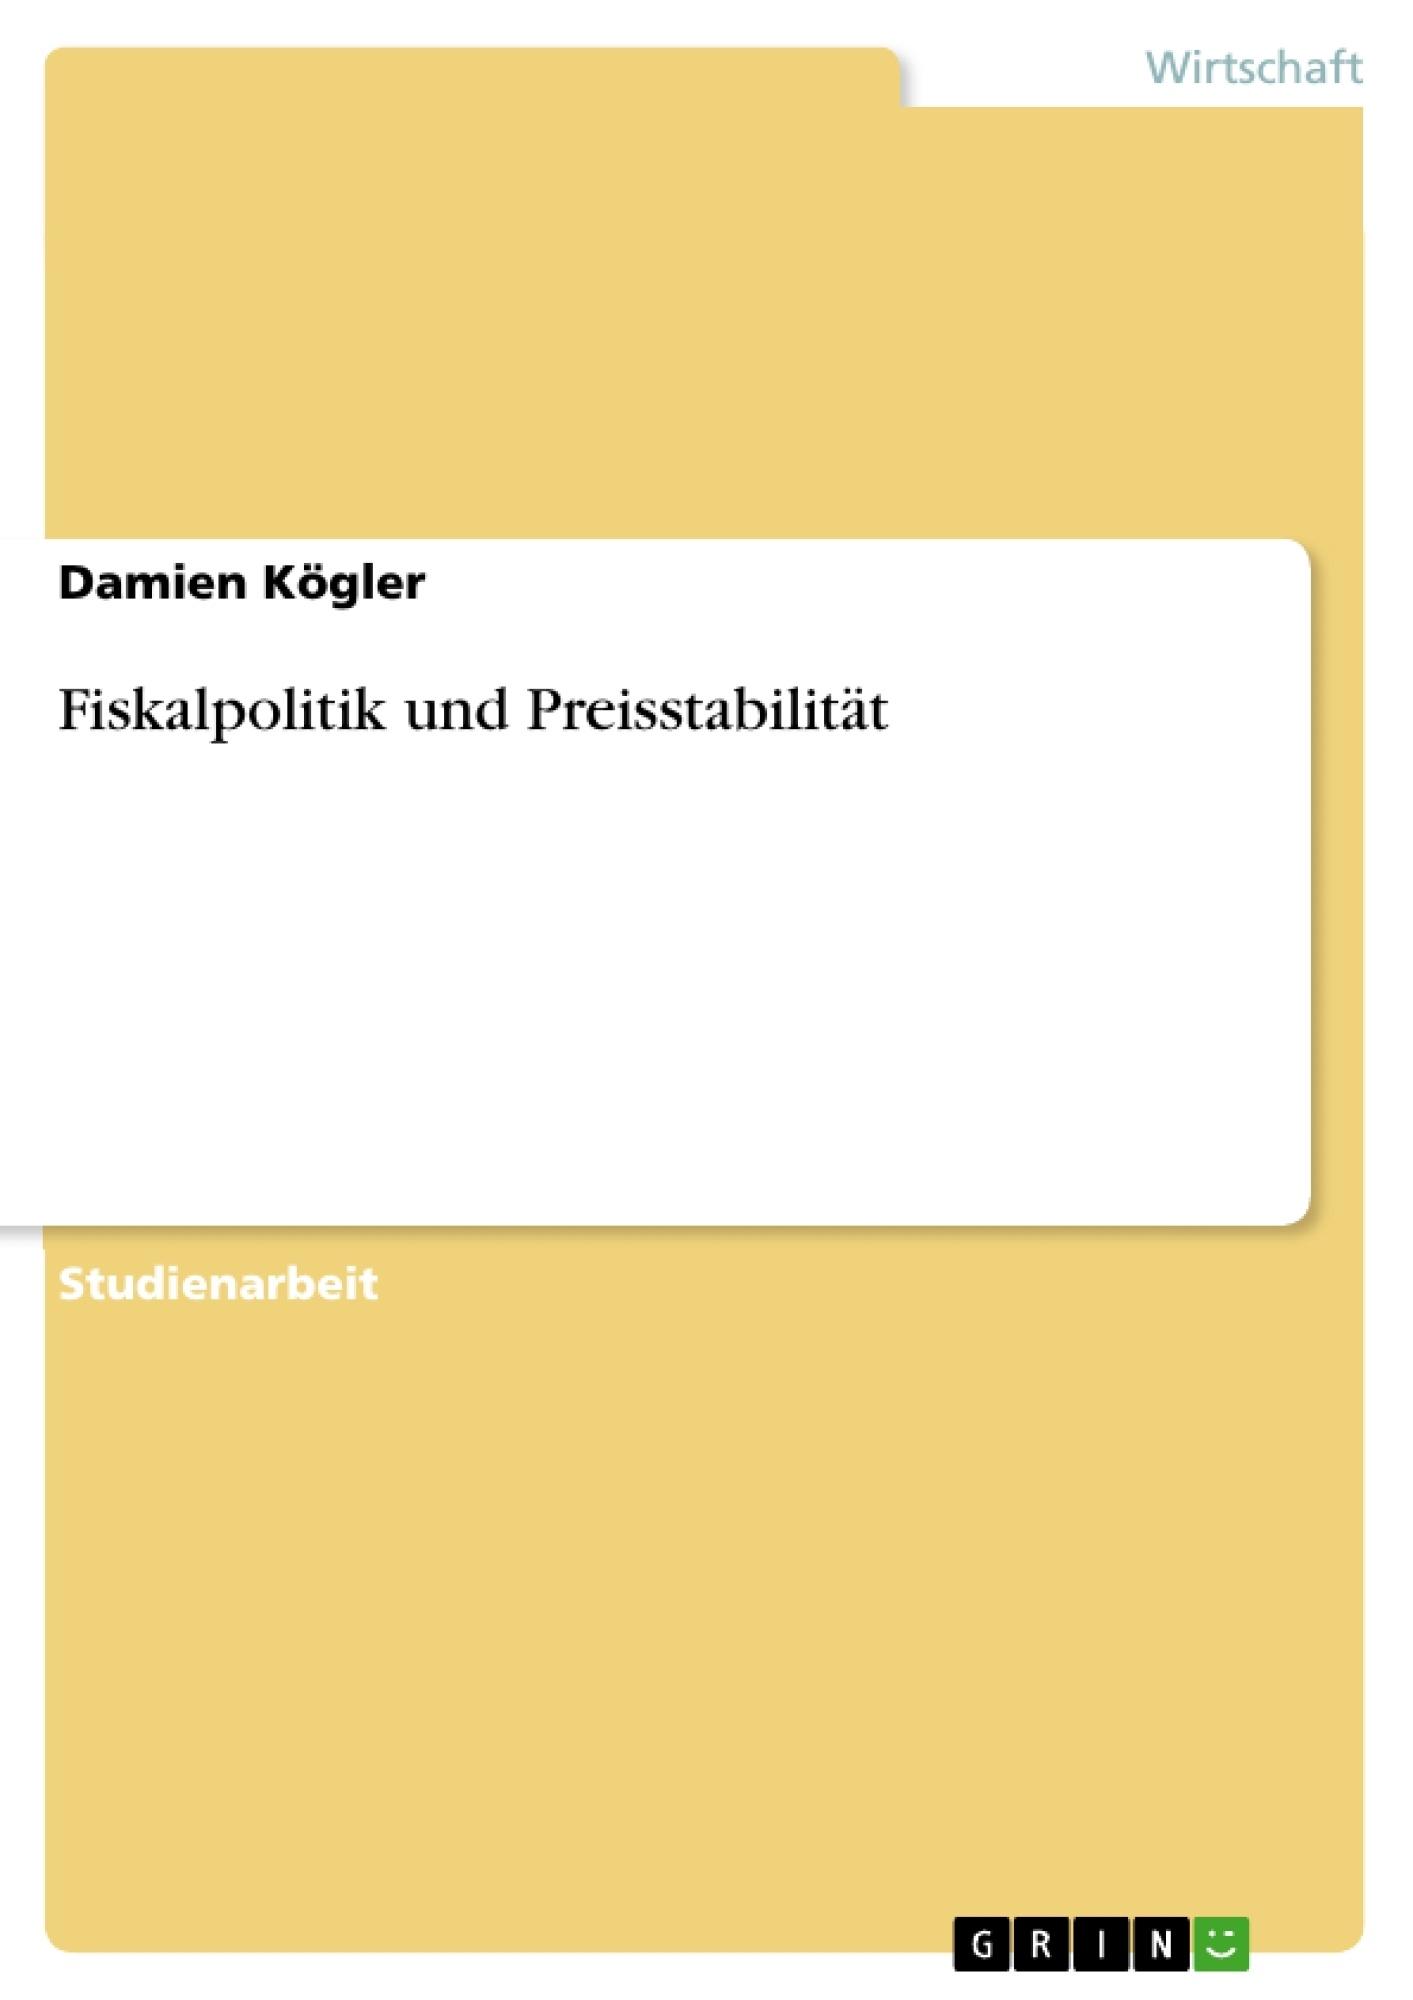 Titel: Fiskalpolitik und Preisstabilität